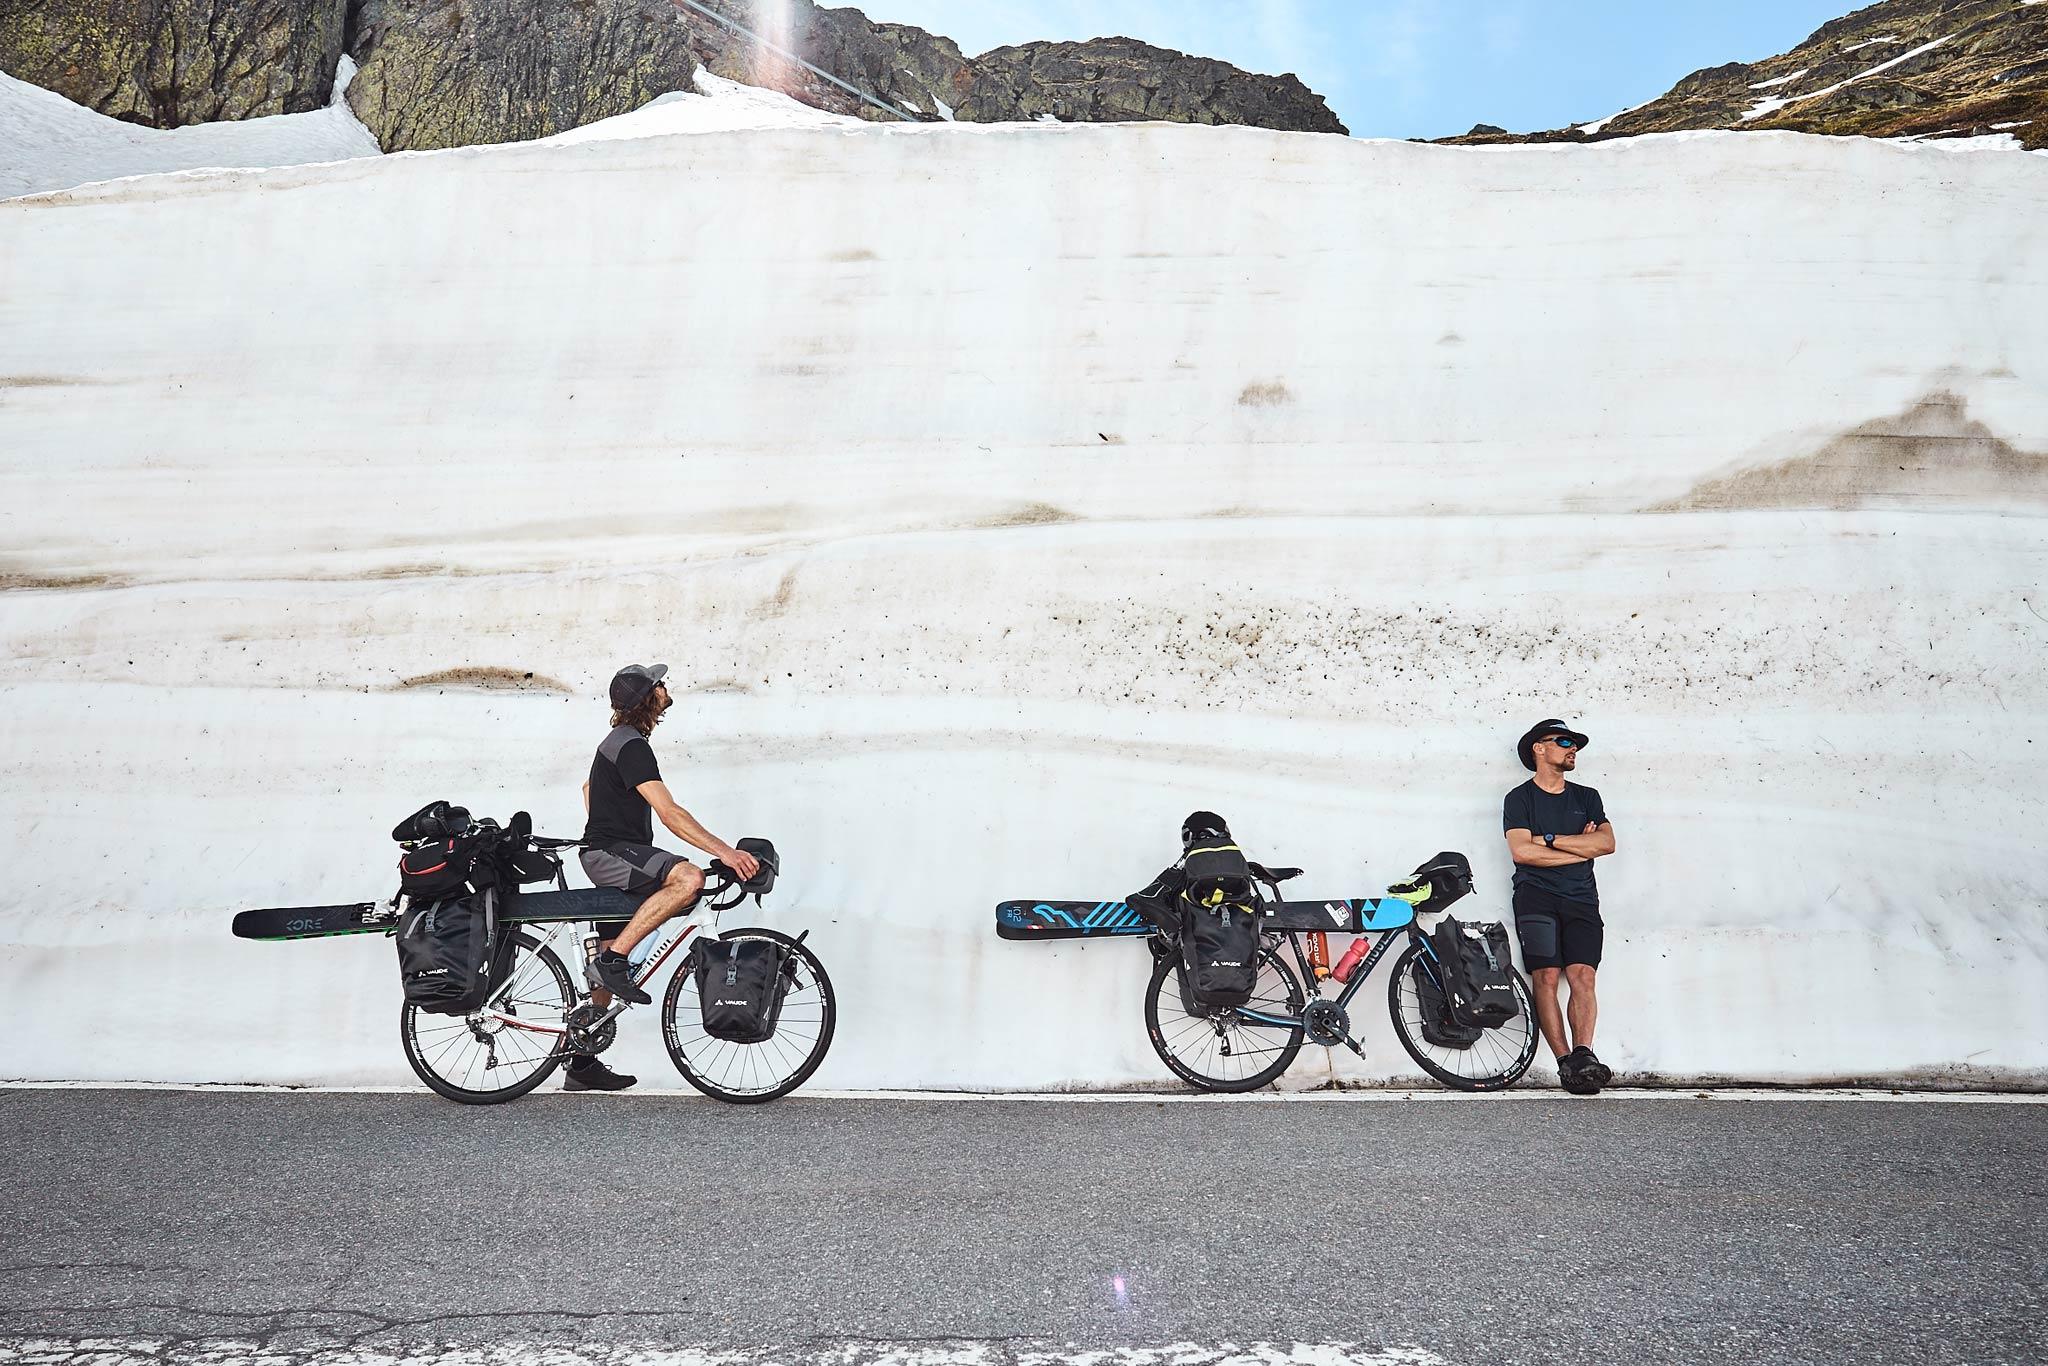 Jochen Mesle & Max Kroneck - Foto: Philipp Becker